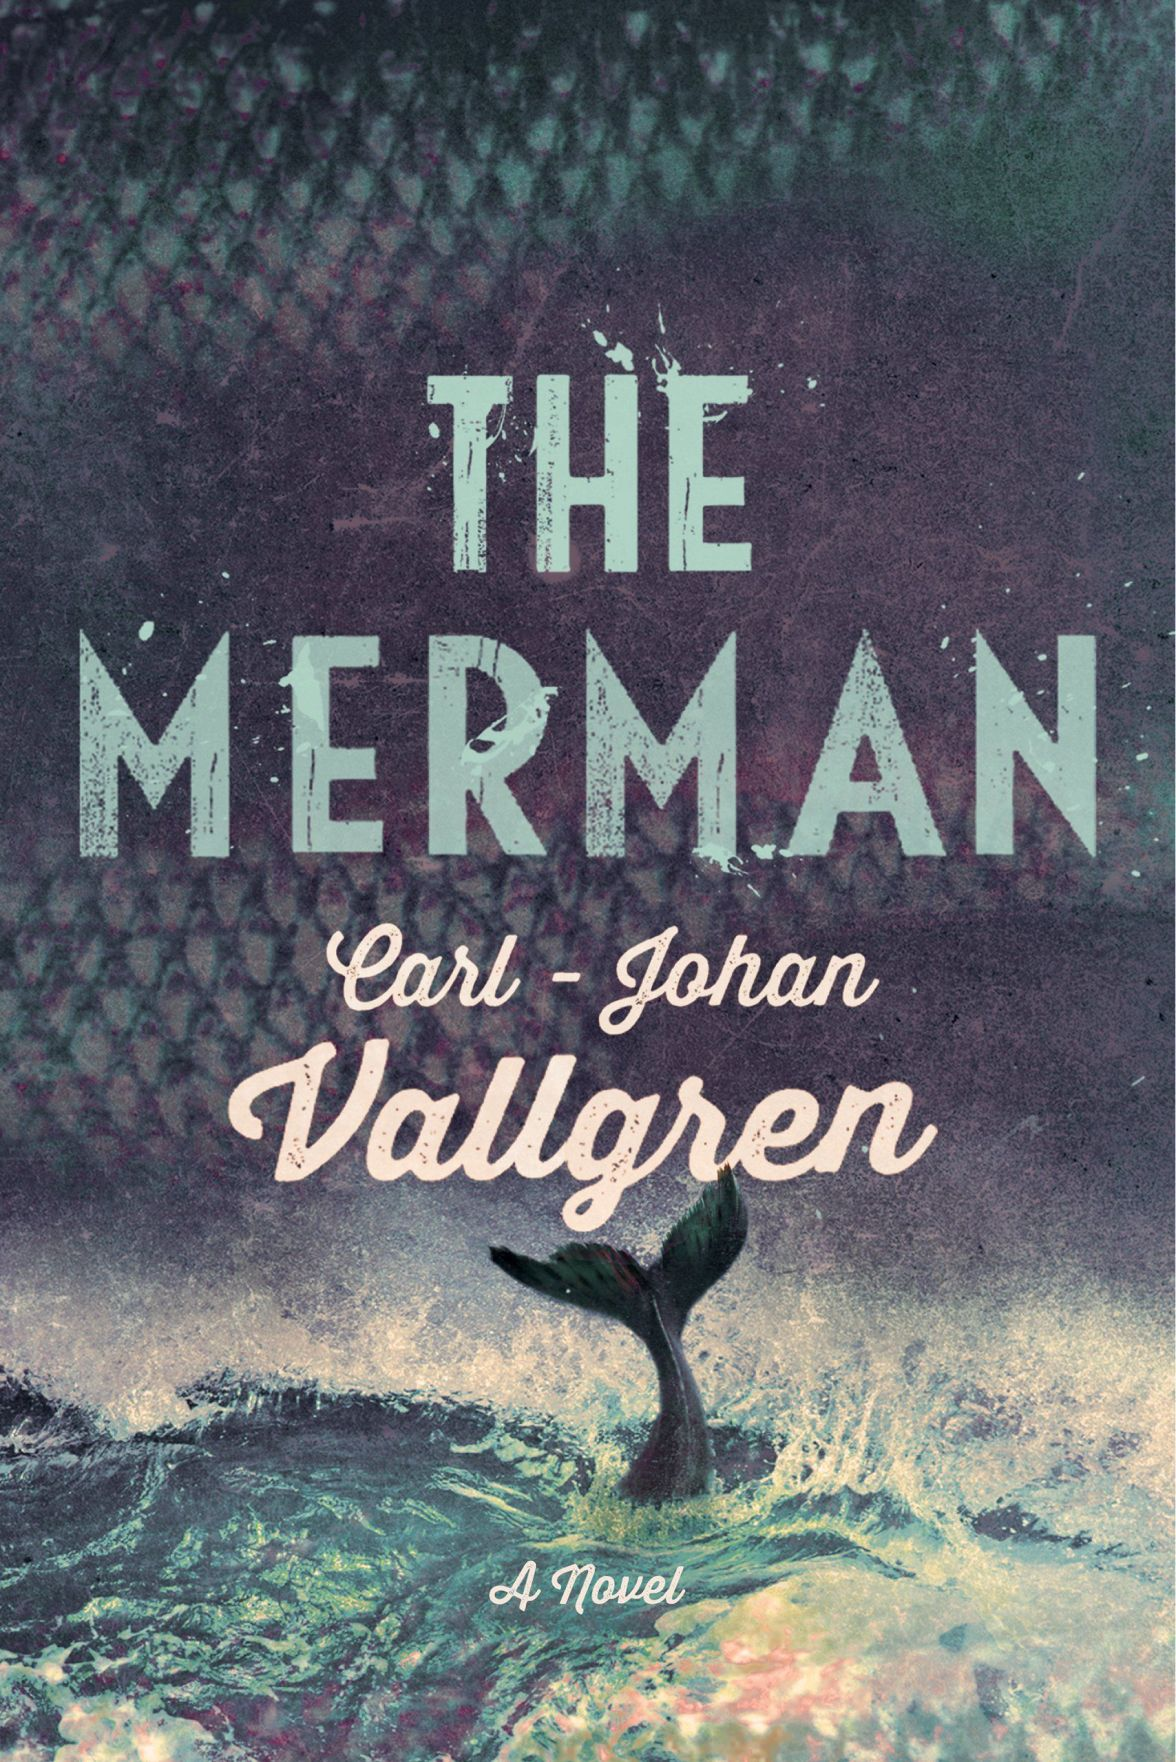 'The Merman' a dark fairy tale from Sweden